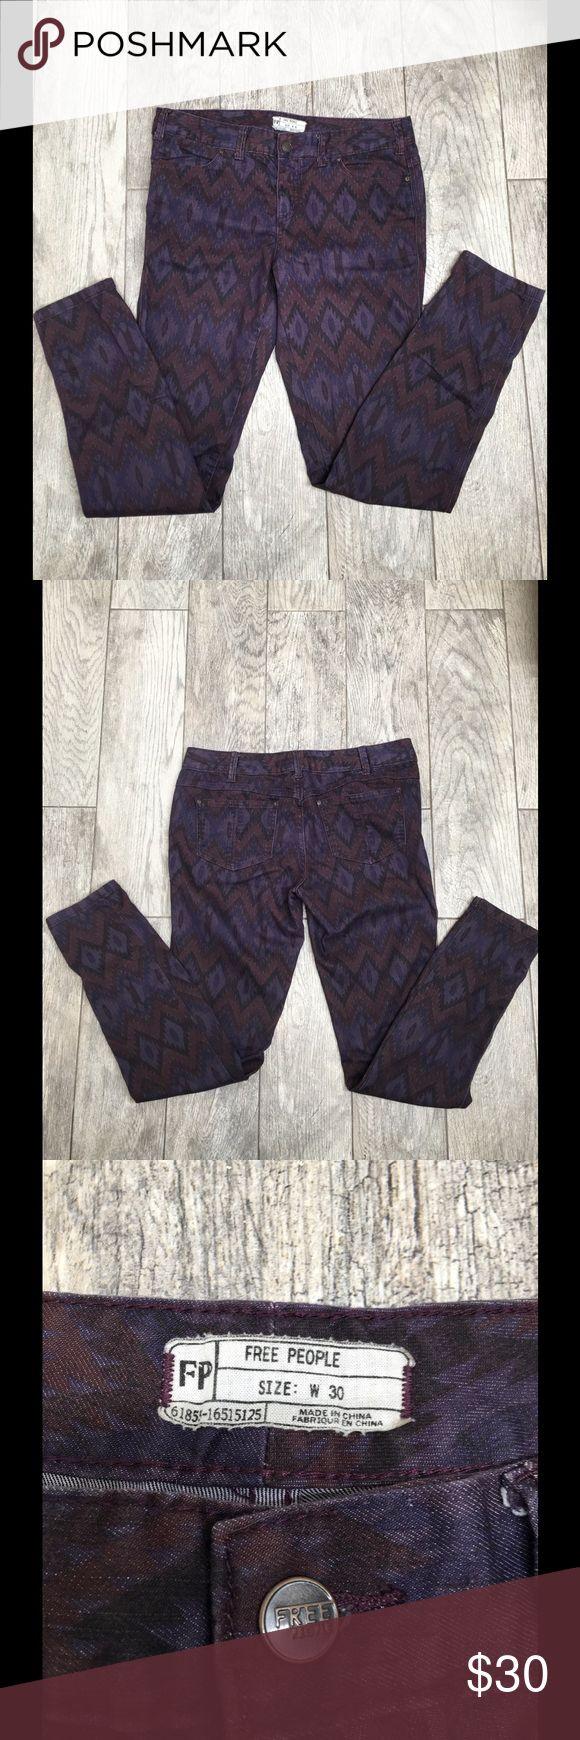 "Free People Ikat purple skinny  jeans Free People Ikat purple skinny  jeans, super cute print. EUC. Size 30. Measurements: waist 17"" inseam 31"" Free People Jeans Skinny"